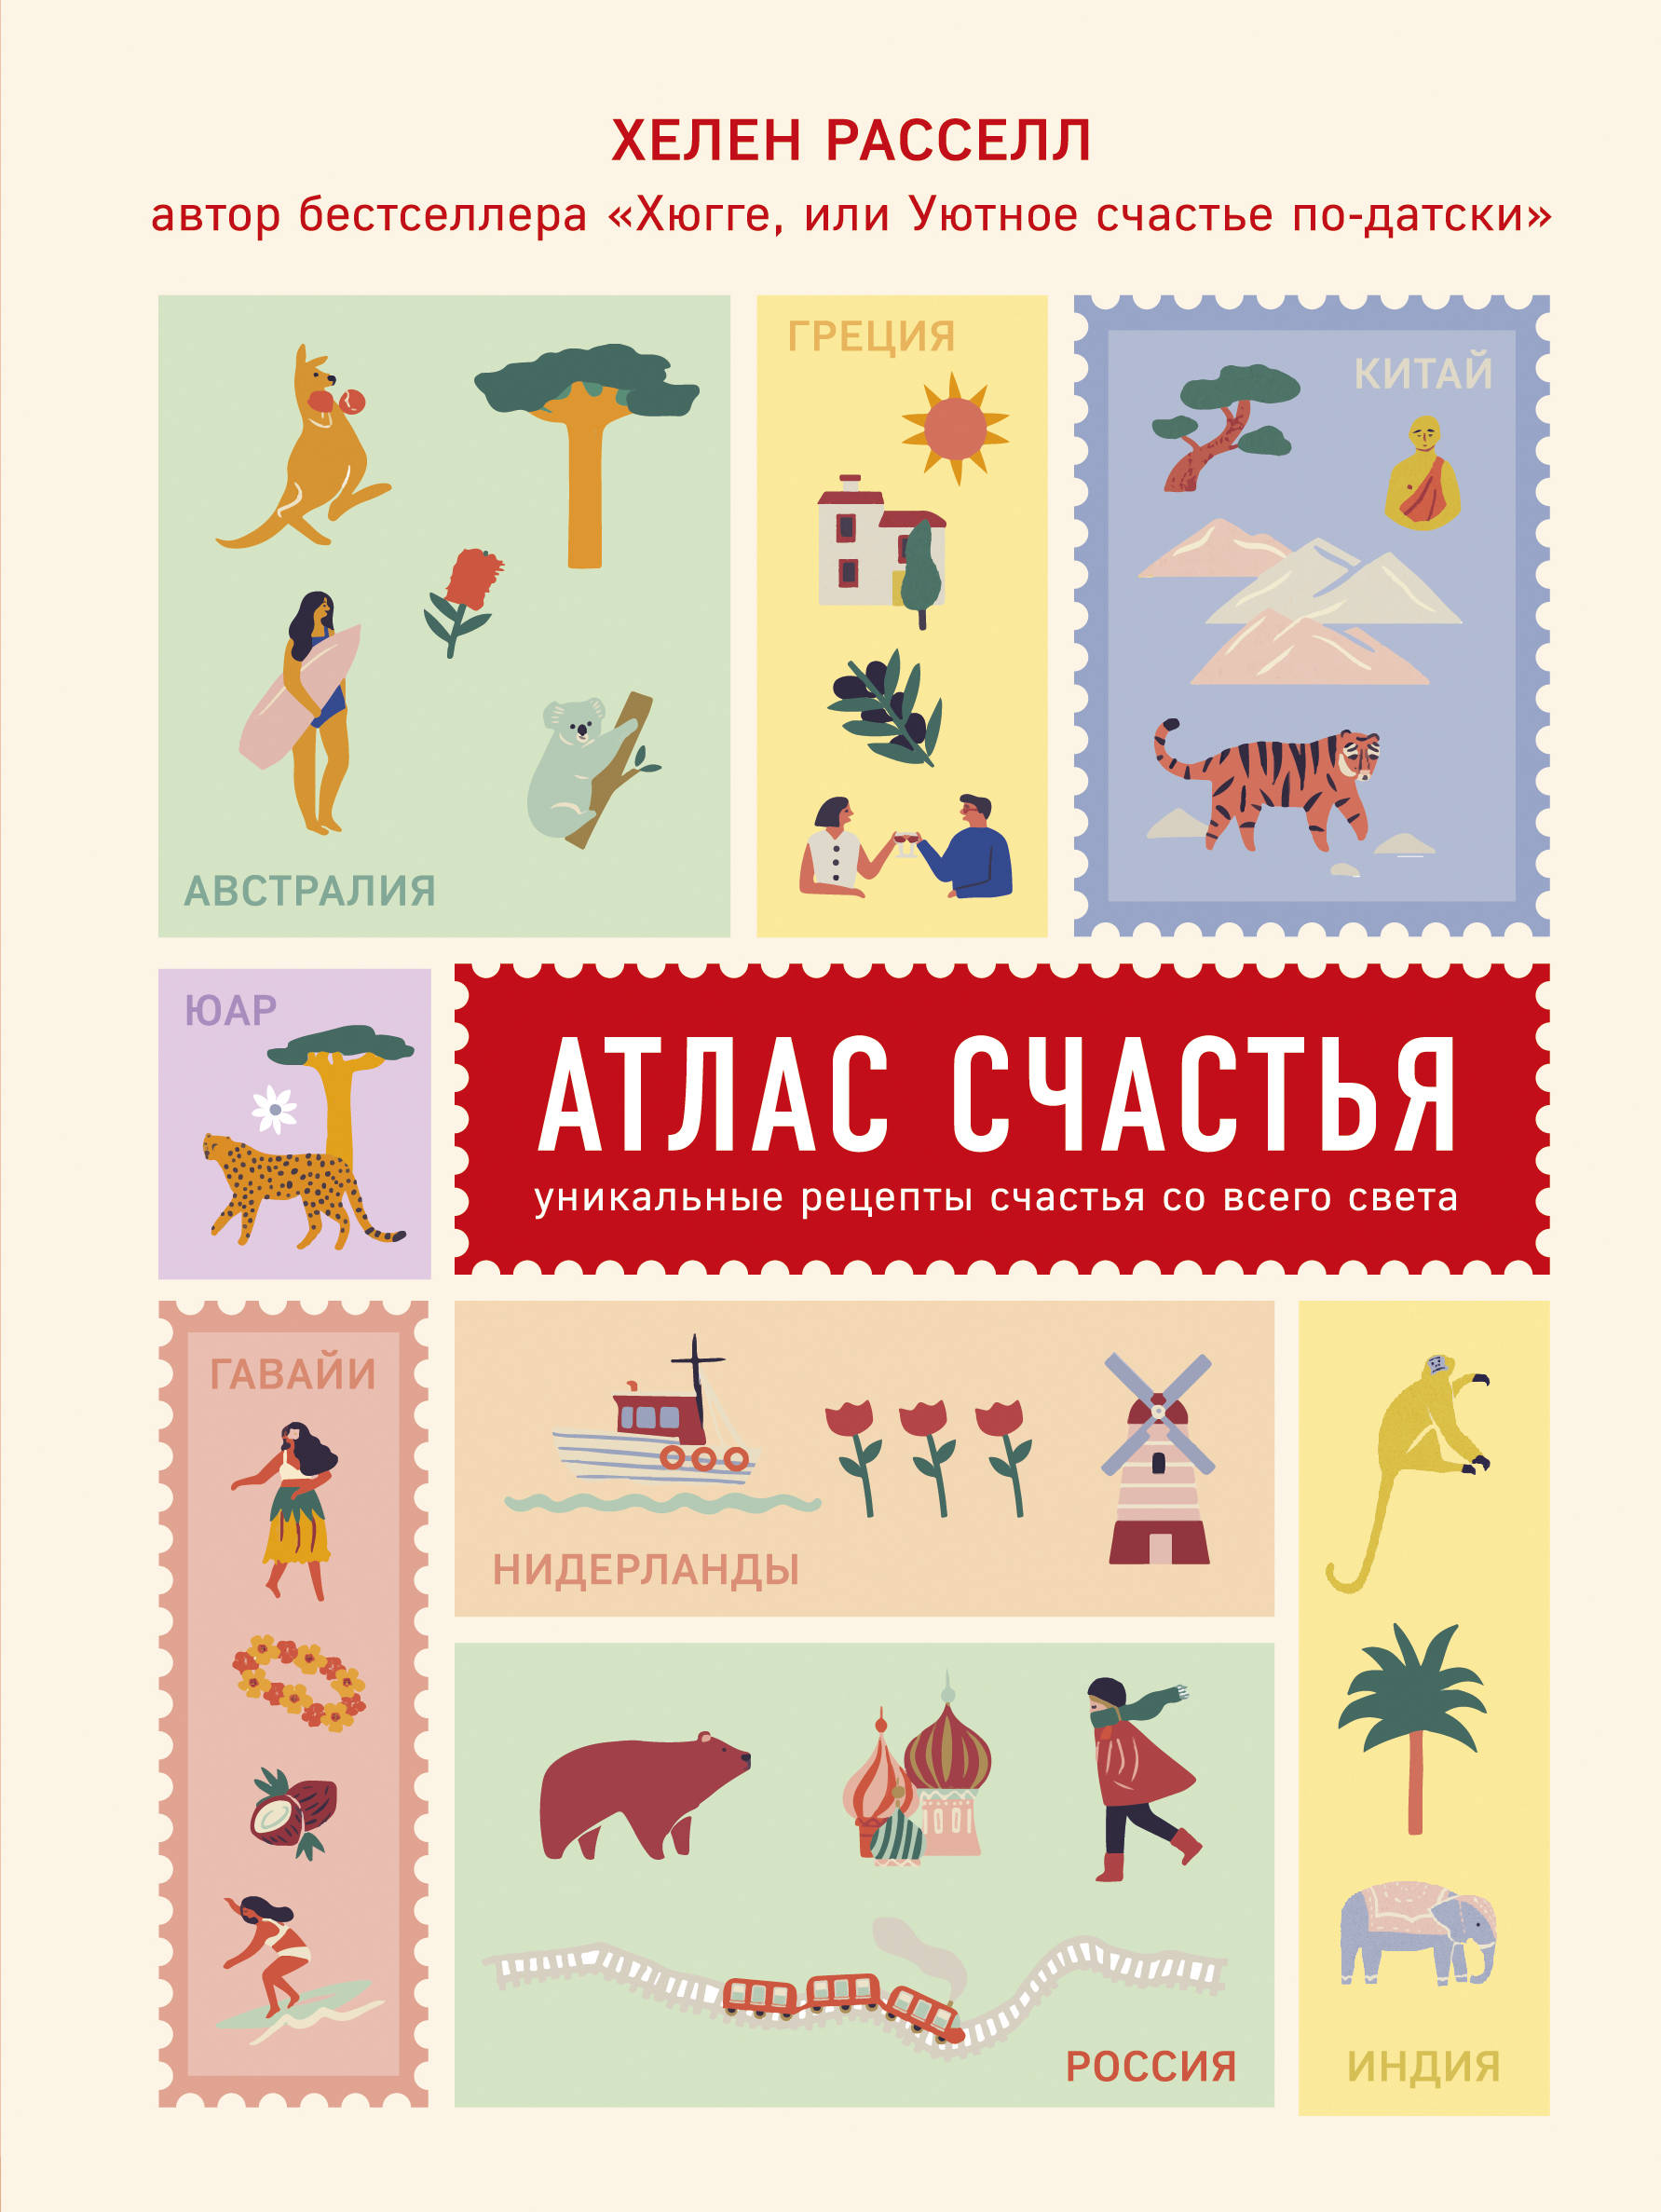 Atlas schastja. Unikalnye retsepty schastja so vsego sveta